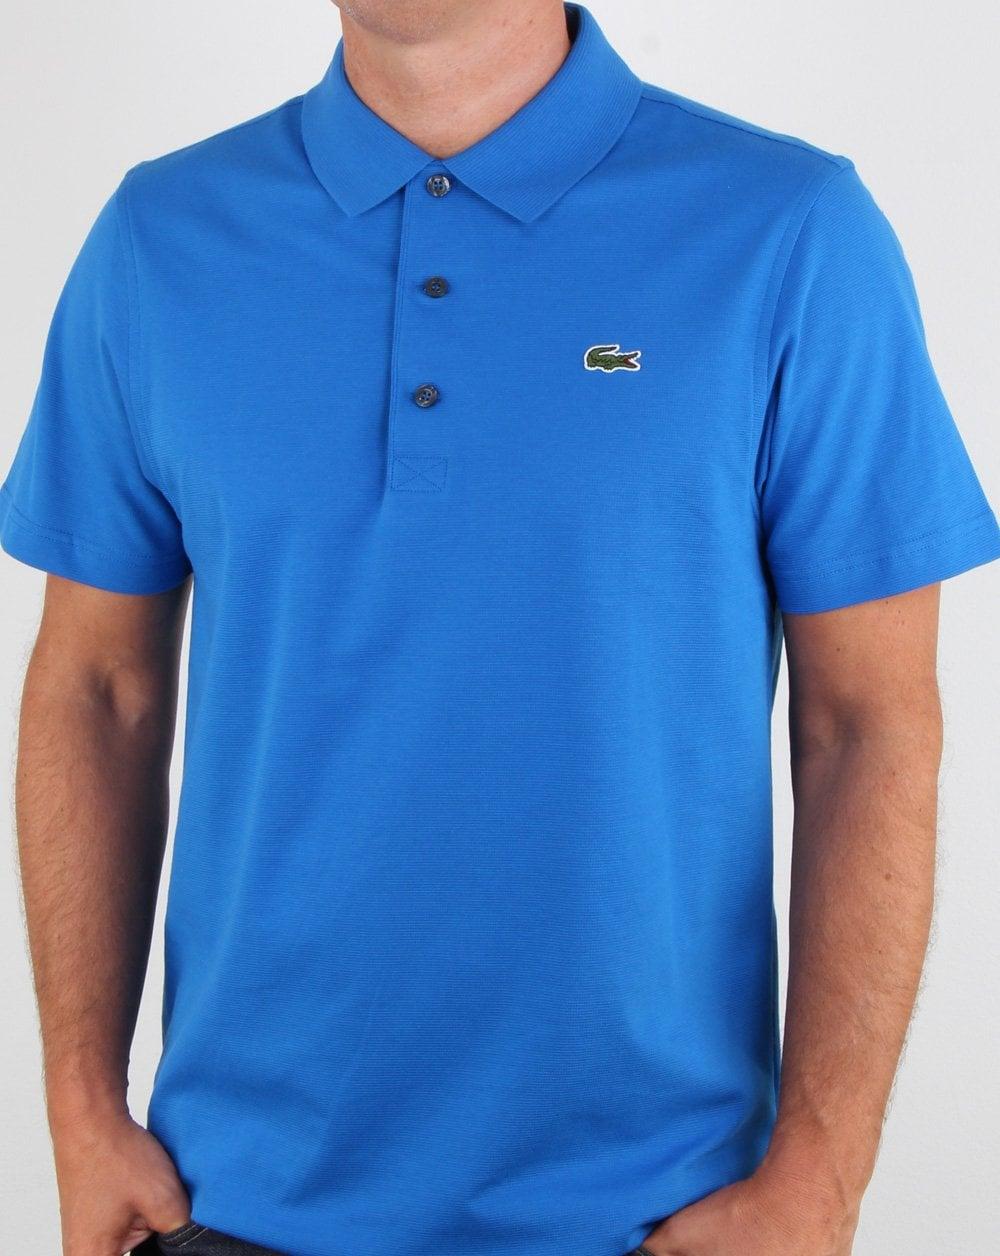 Polo Royal Shirt Blue Polo Lacoste Lacoste Shirt wukXZOiTPl